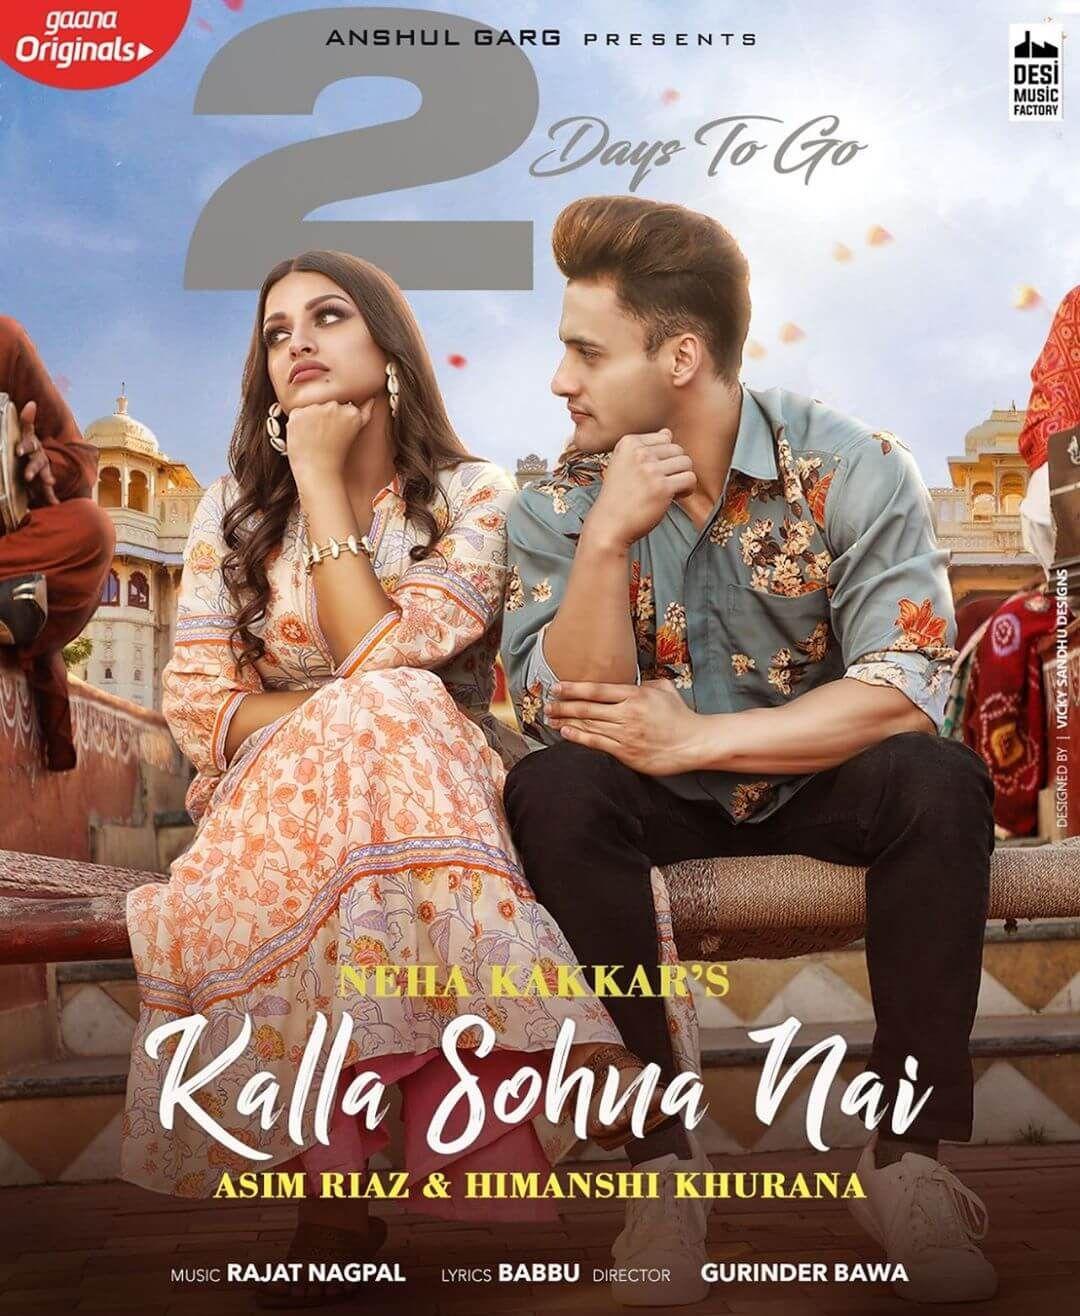 Kalla Sohna Nai Song Lyrics Hindi English Neha Kakkar Best 2020 In 2020 Desi Music Bollywood Songs Songs